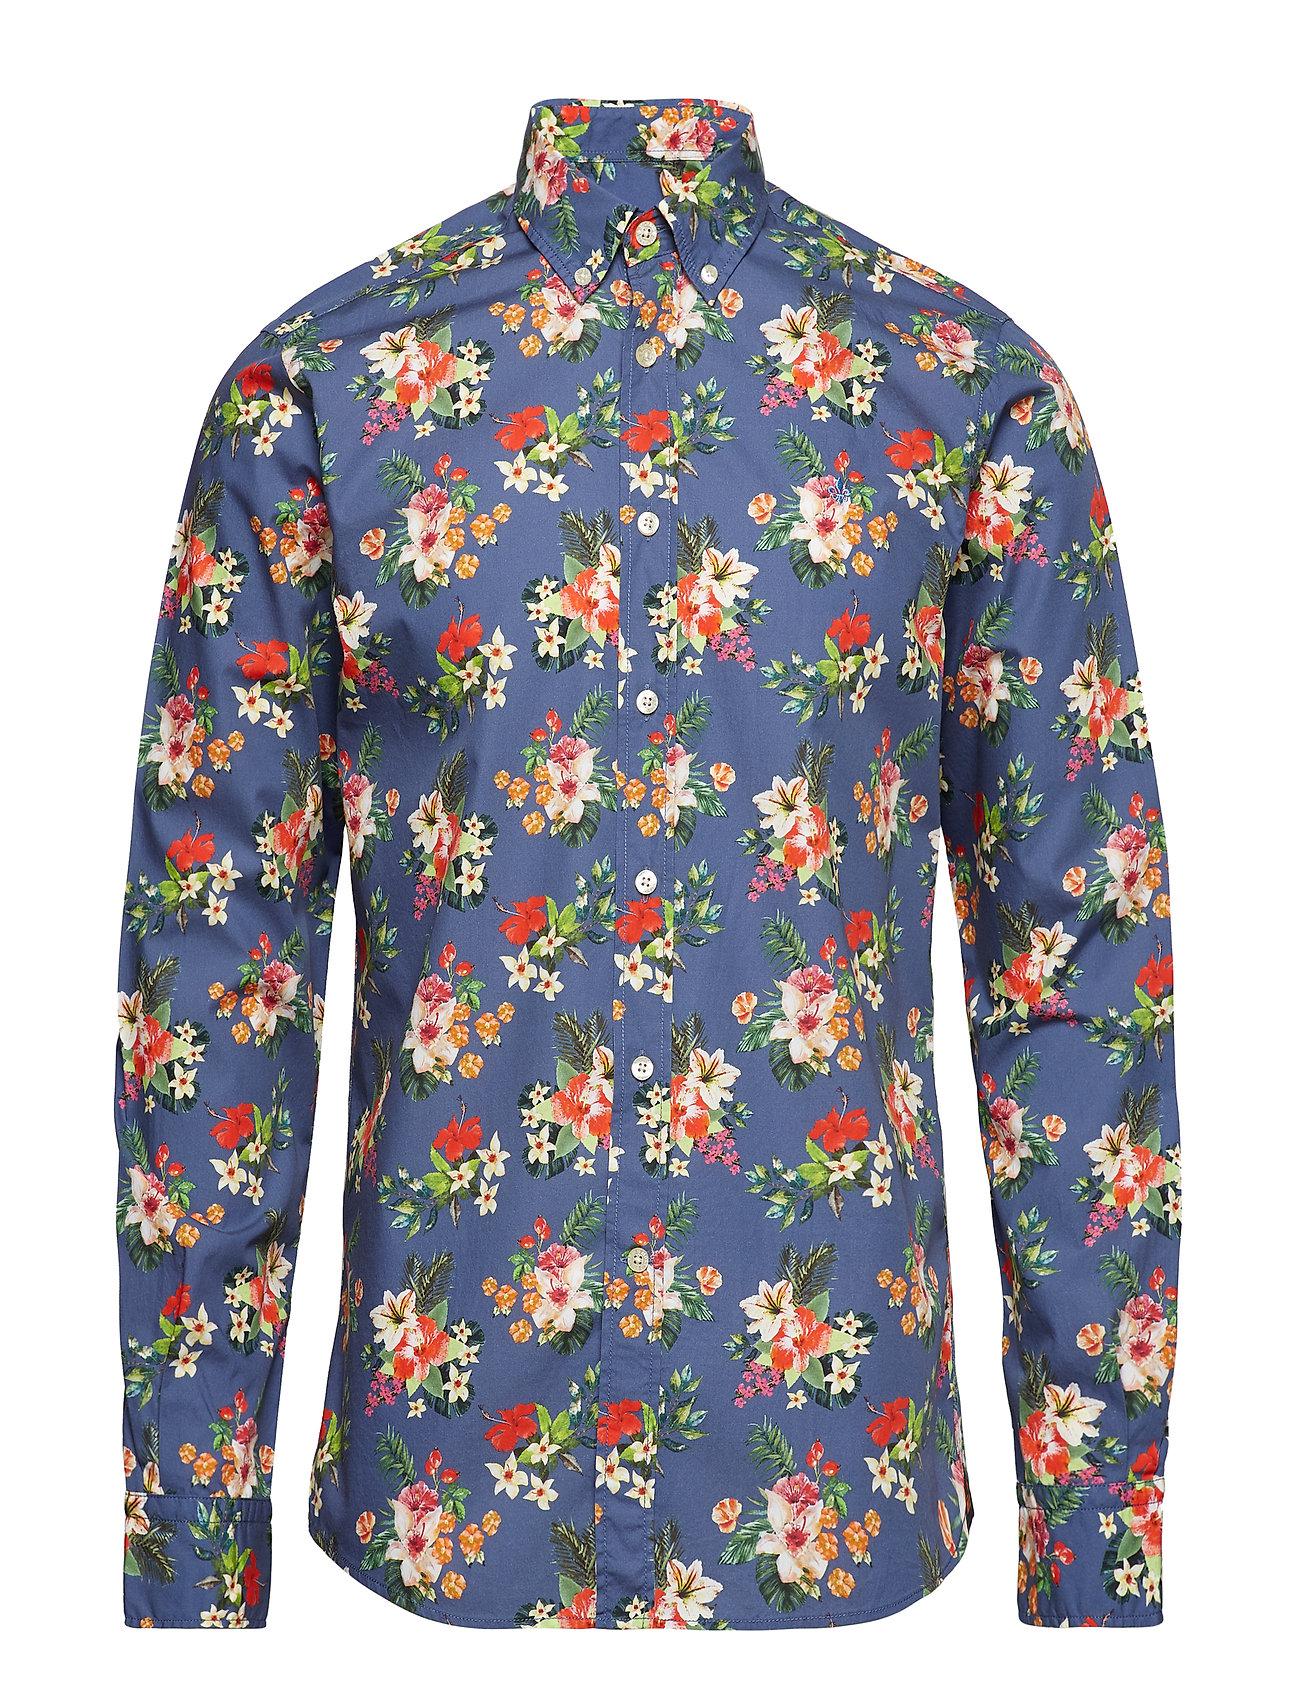 Morris Dan Button Down Shirt - NAVY